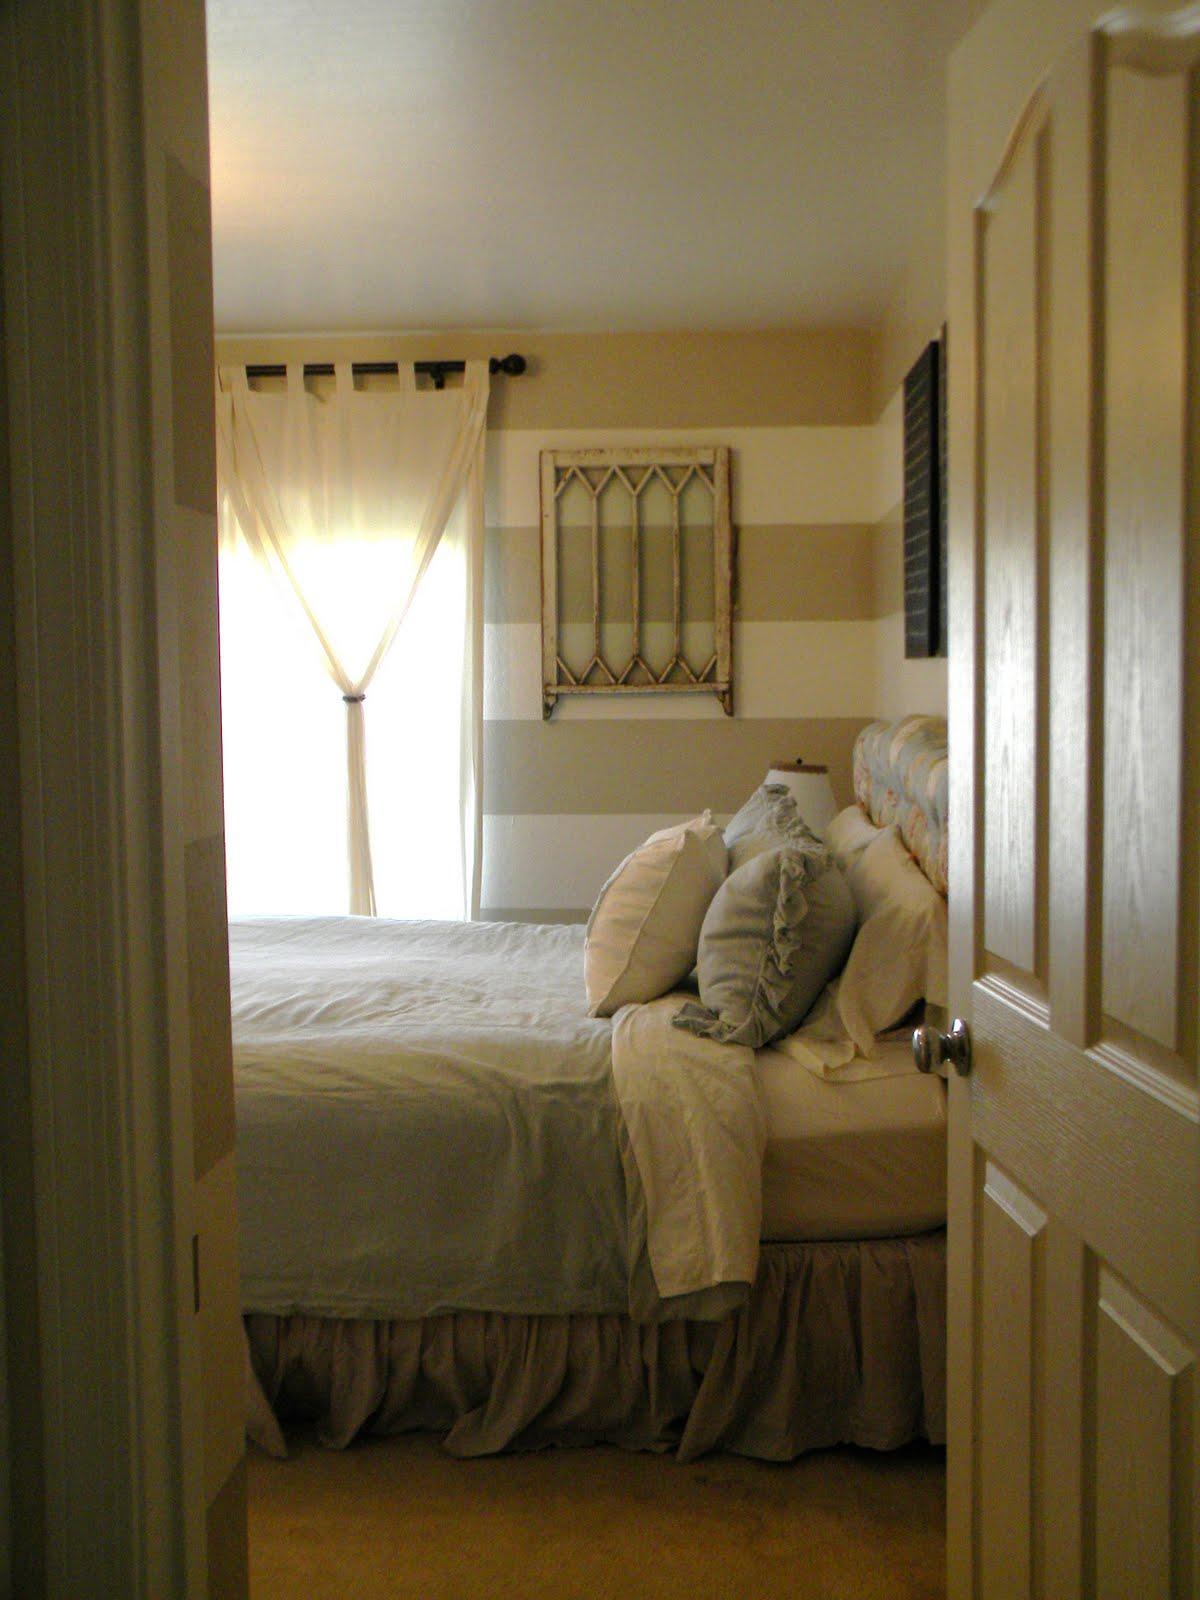 Small Space Design Bedroom Bedroom Small Space Design Kpphotographydesigncom